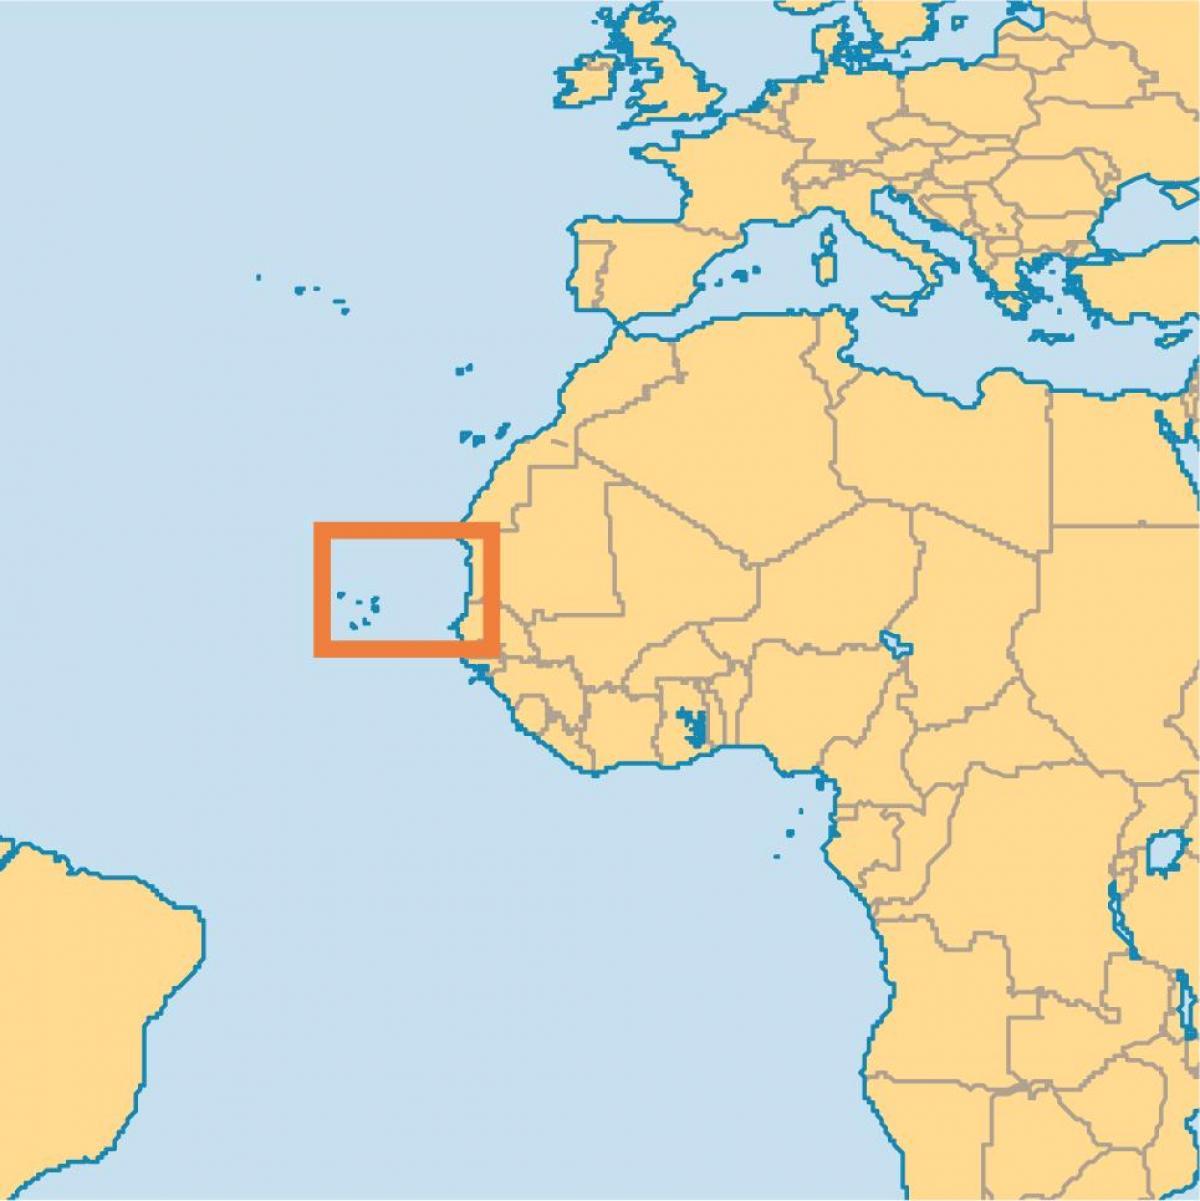 kart kapp verde Cape Verde islands world map   Show Cape Verde on world map